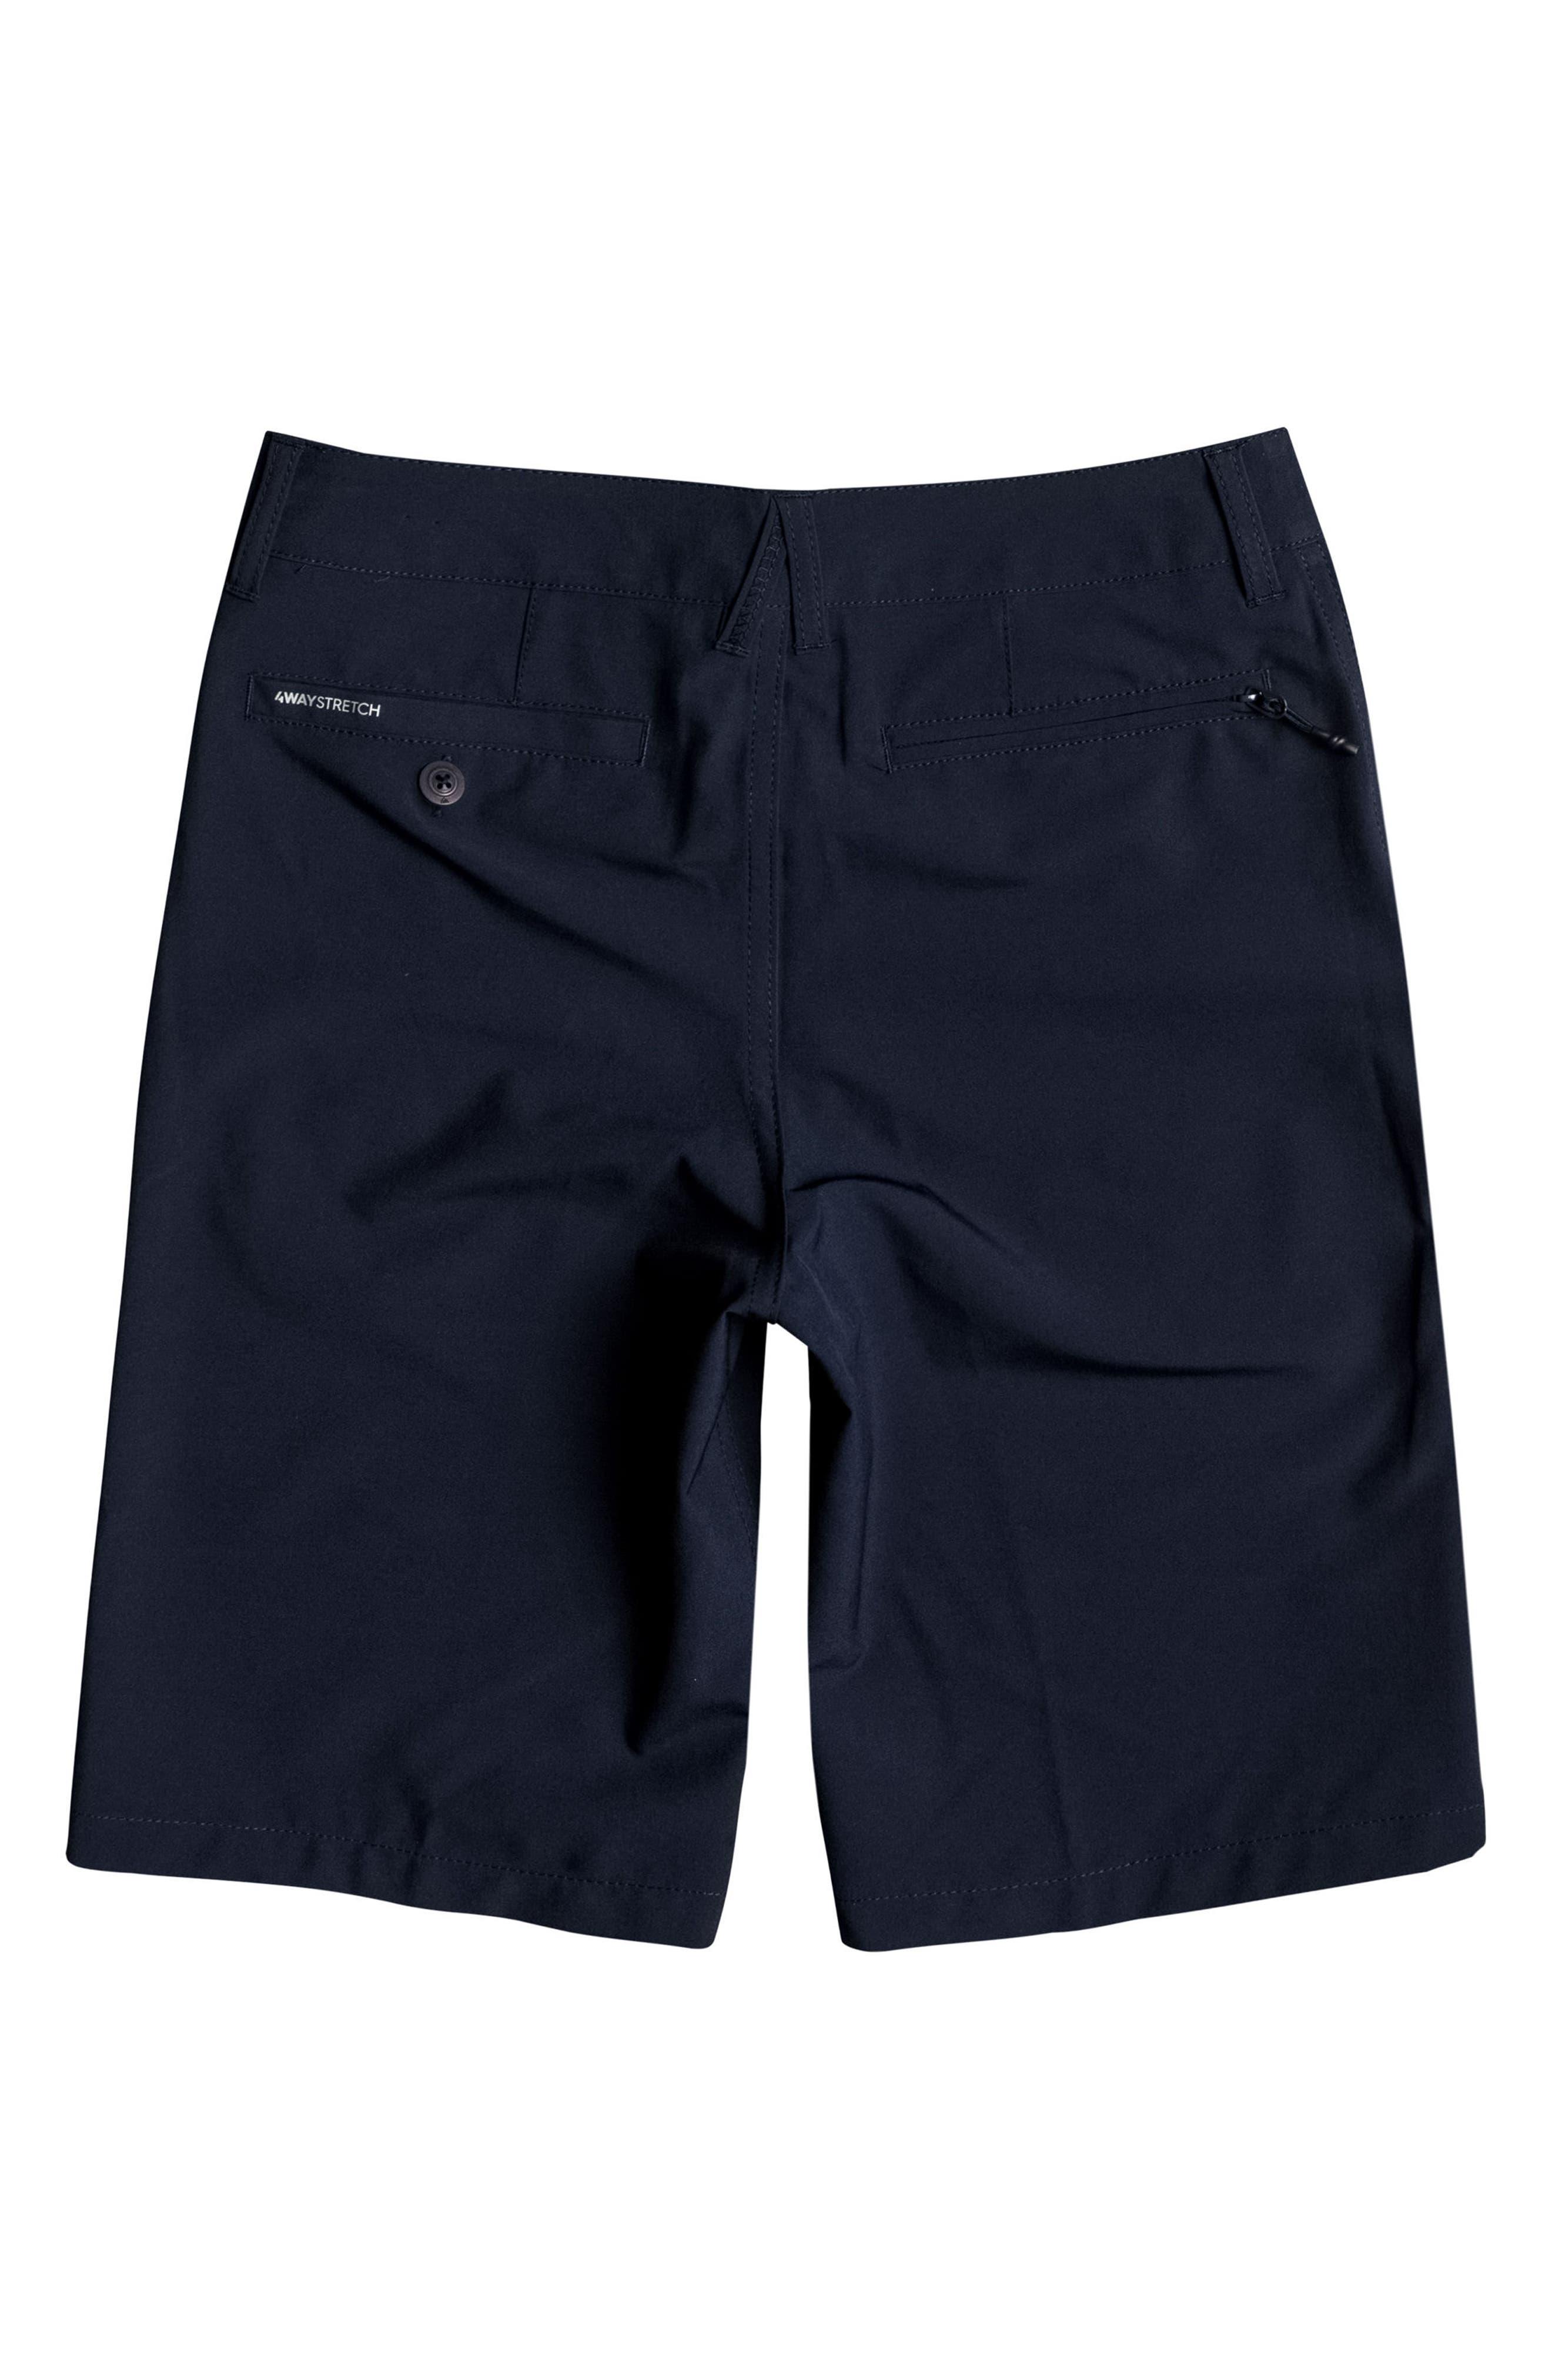 Union Amphibian Board Shorts,                             Alternate thumbnail 8, color,